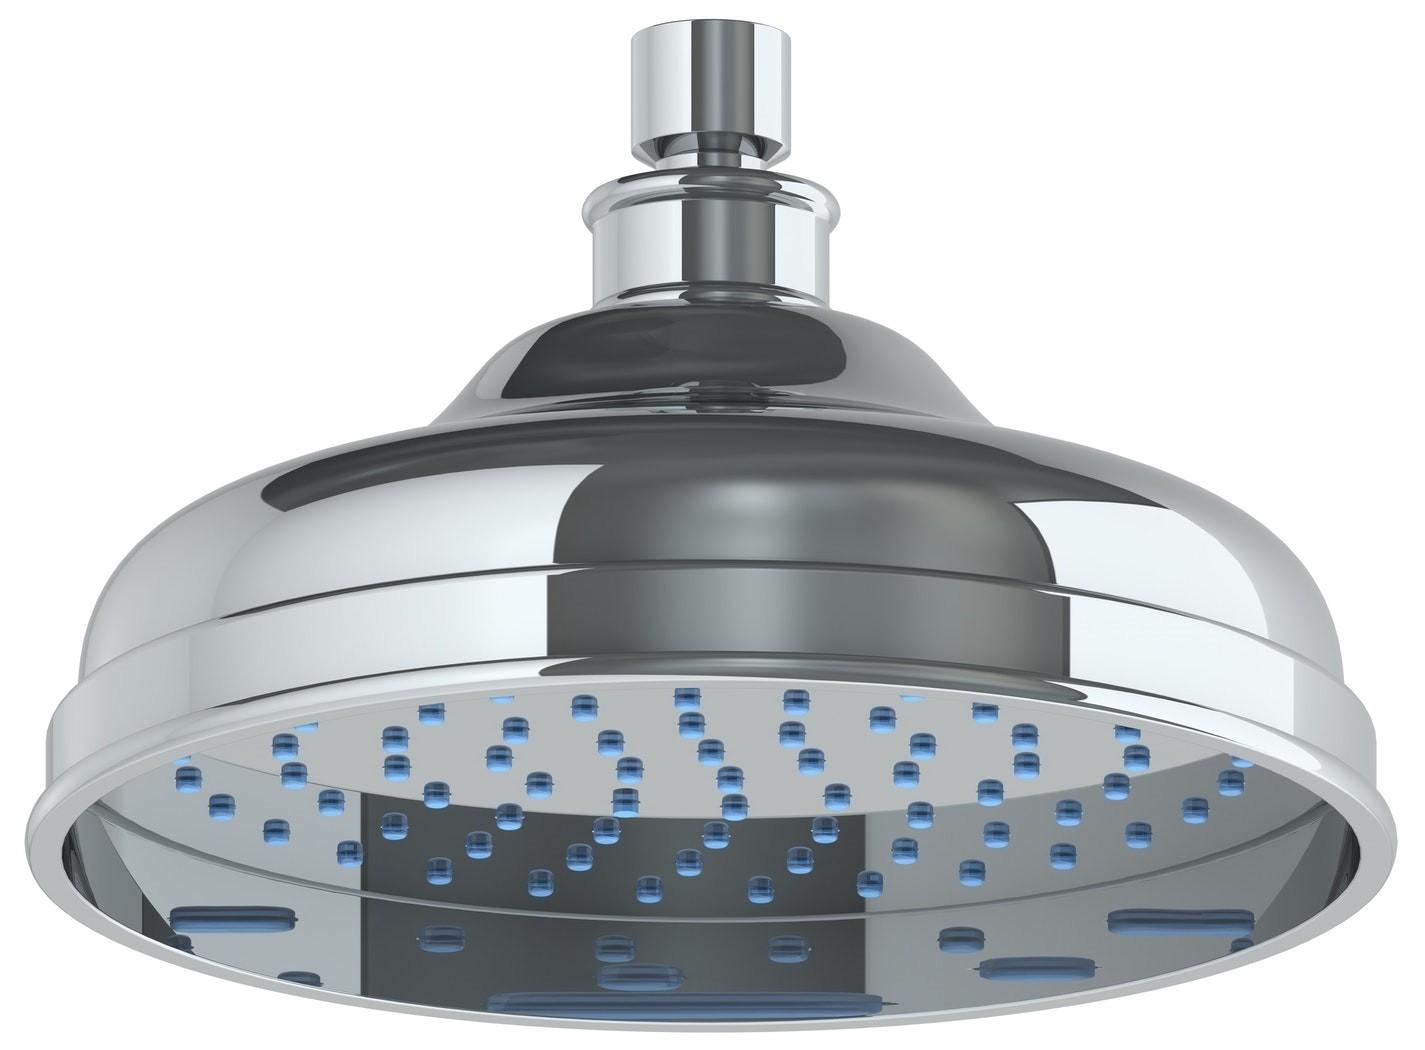 WATERMARK SH-RH075 8 INCH CEILING MOUNT SINGLE-FUNCTION ROUND SHOWER HEAD